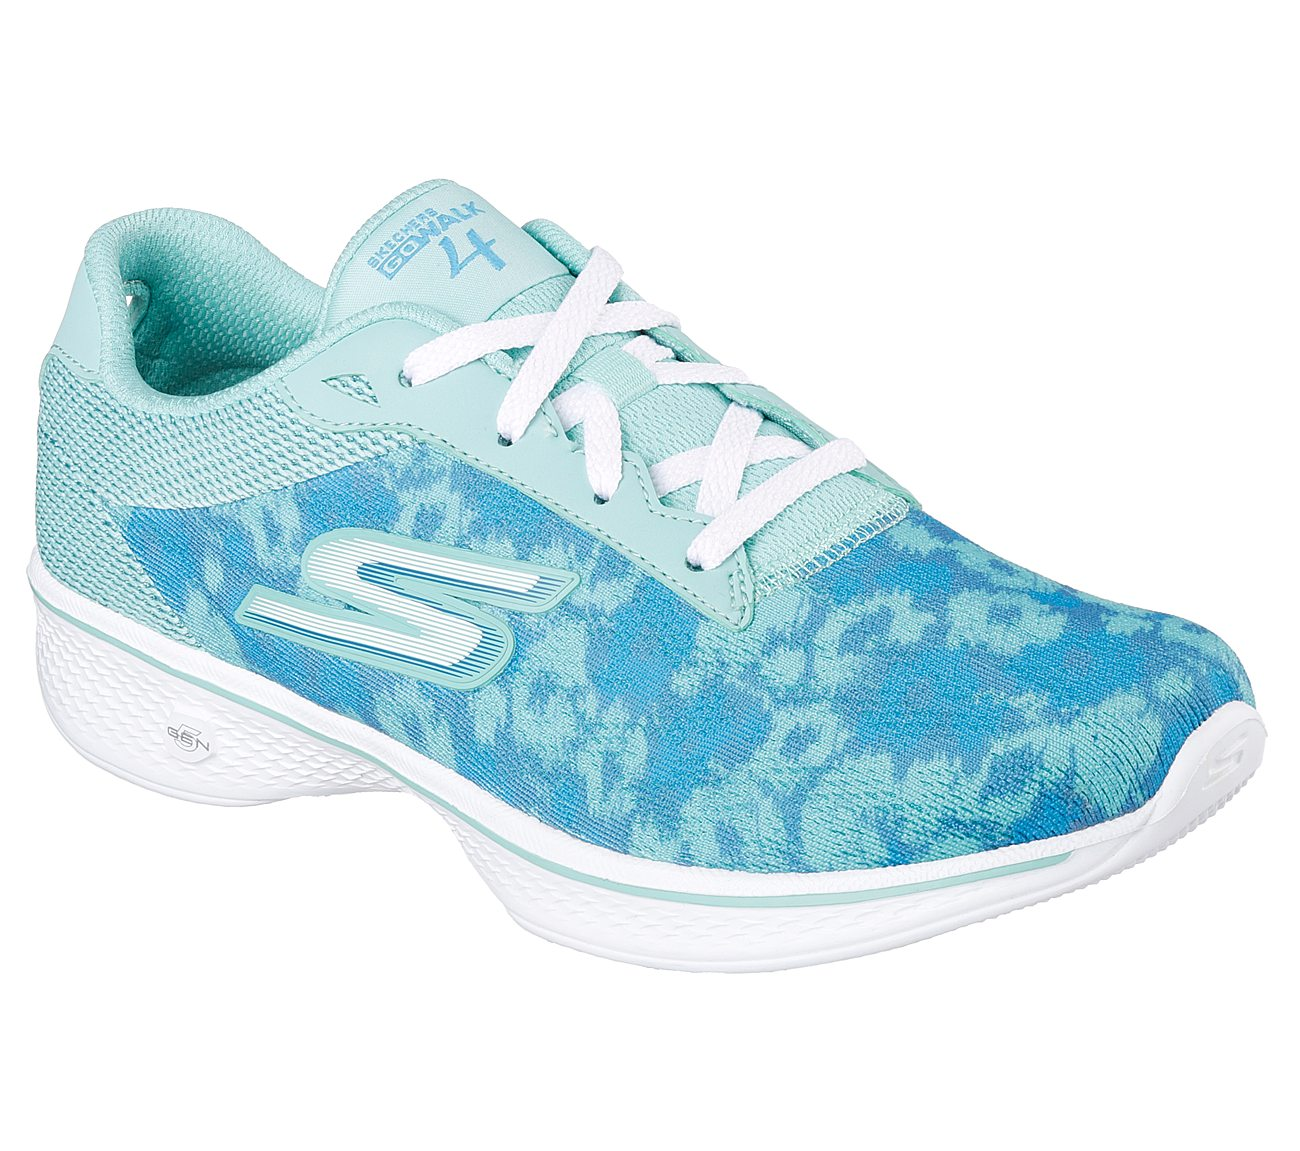 f7b13cc1d258 Buy SKECHERS Skechers GOwalk 4 - Excite Skechers Performance Shoes ...